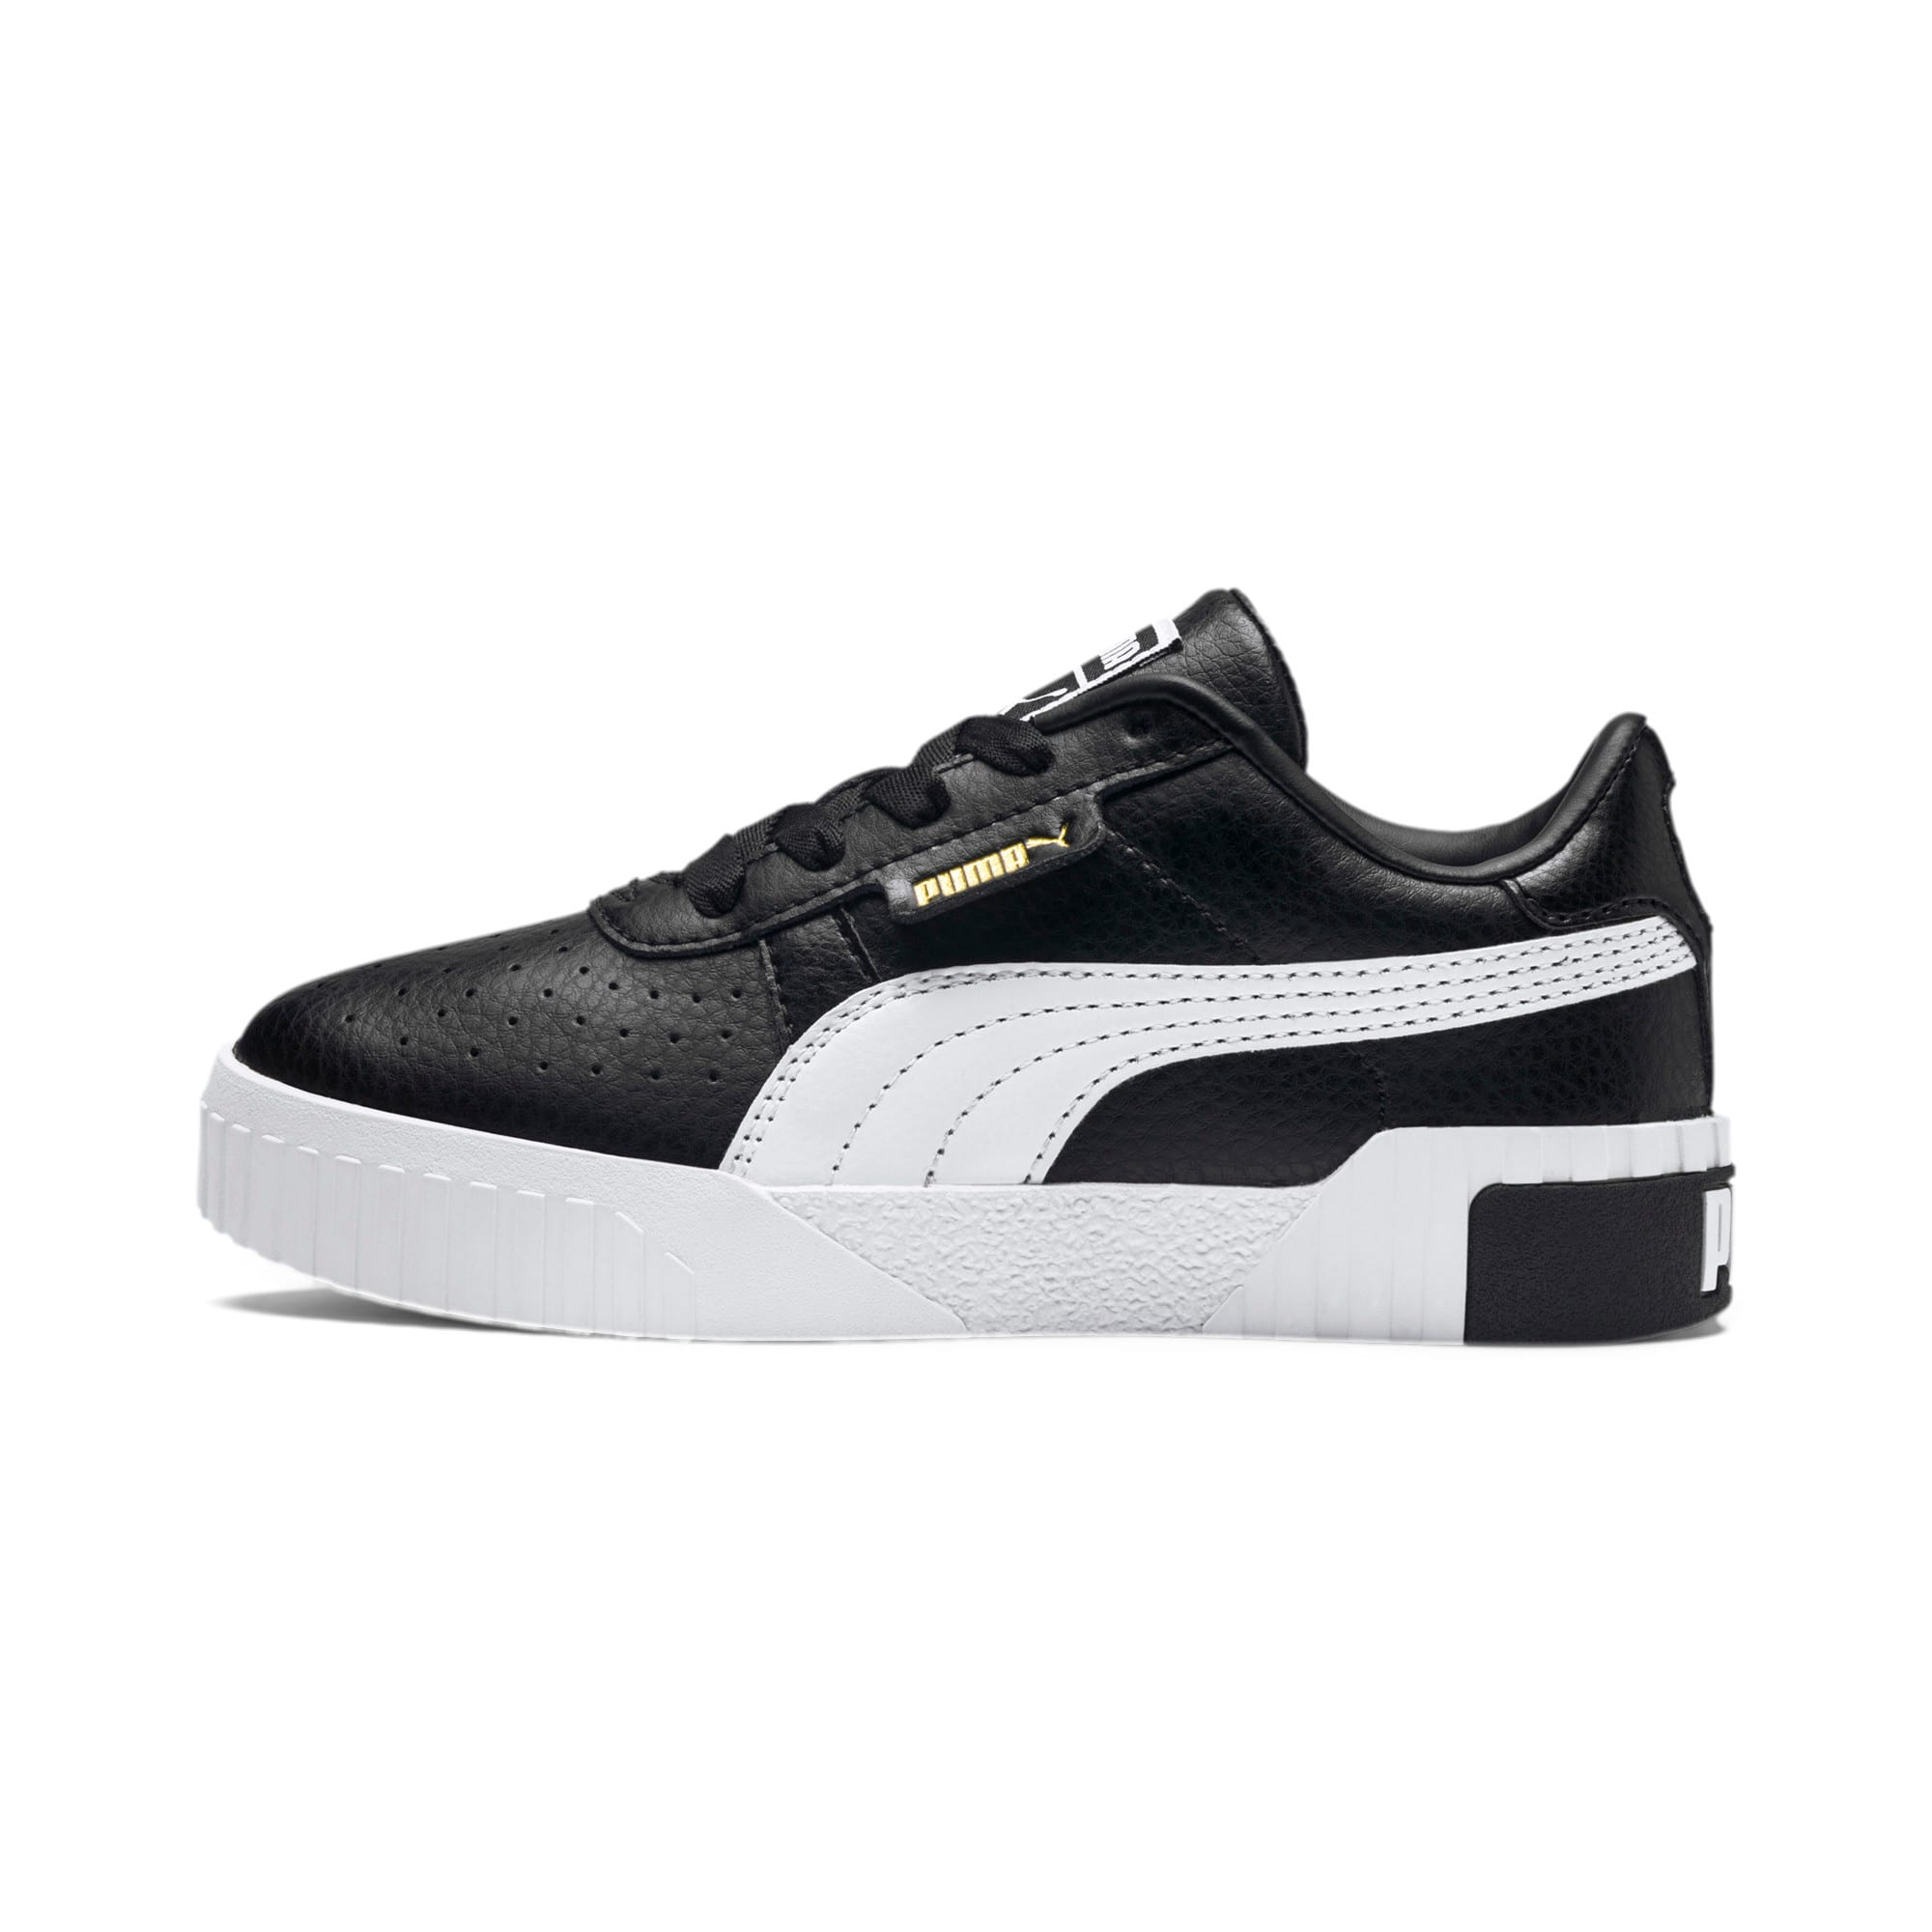 Thumbnail 1 of Cali Little Kids' Shoes, Puma Black-Puma Team Gold, medium